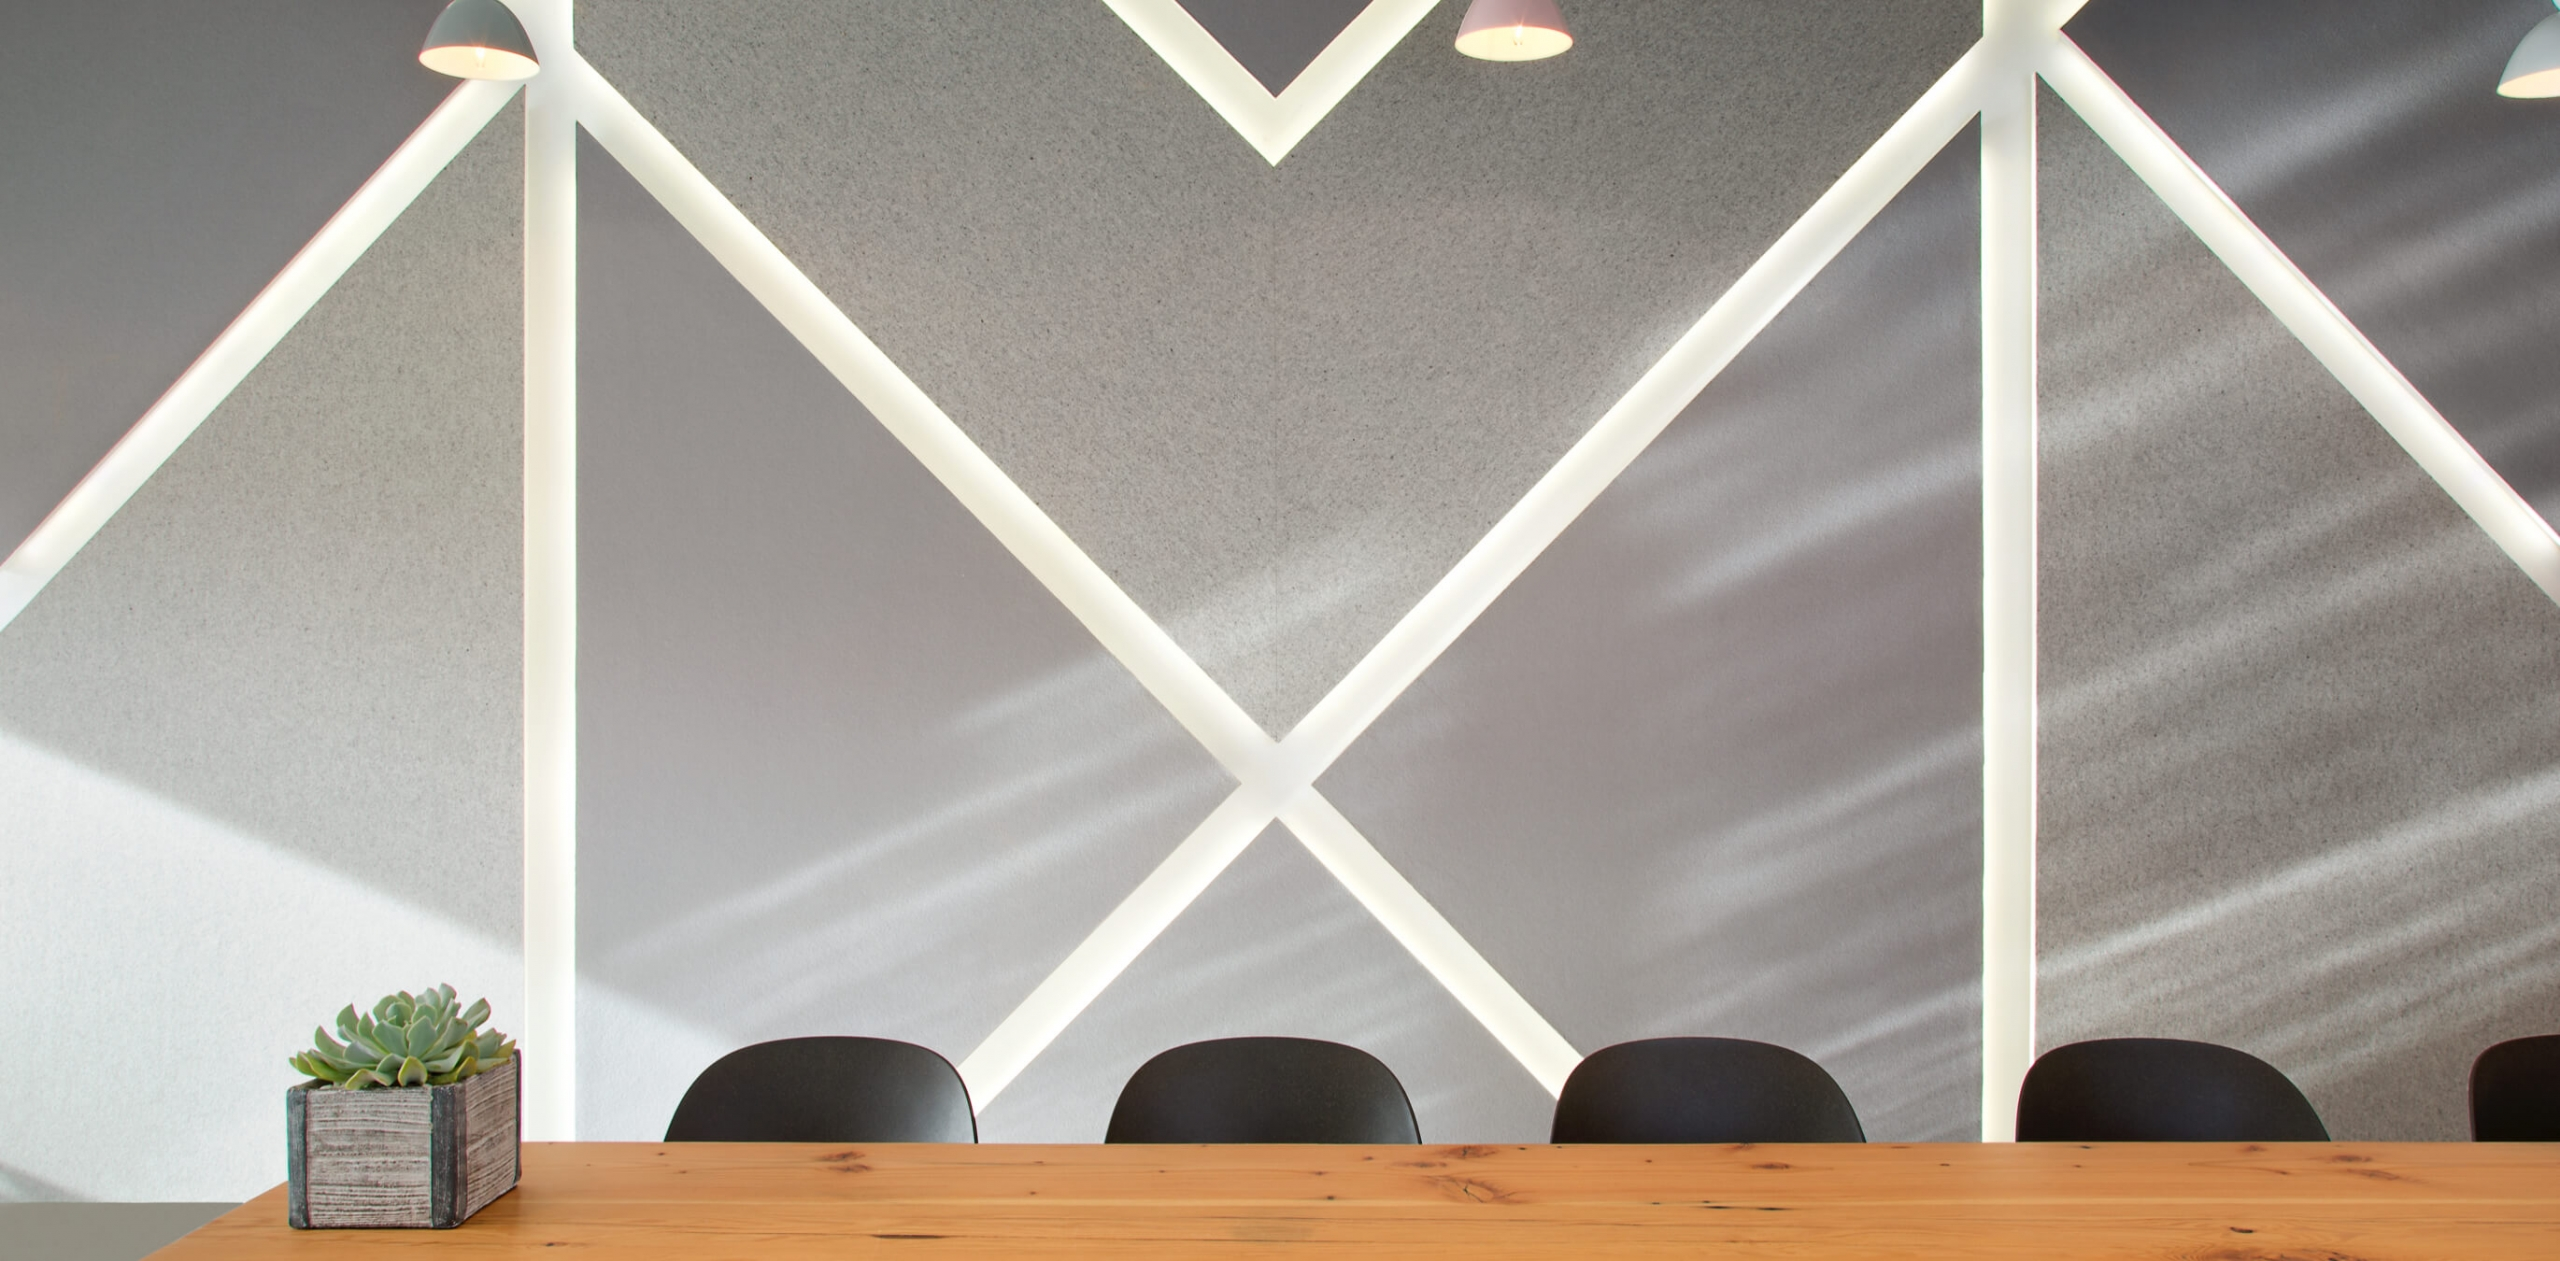 Inside the Faebrew Coffee office